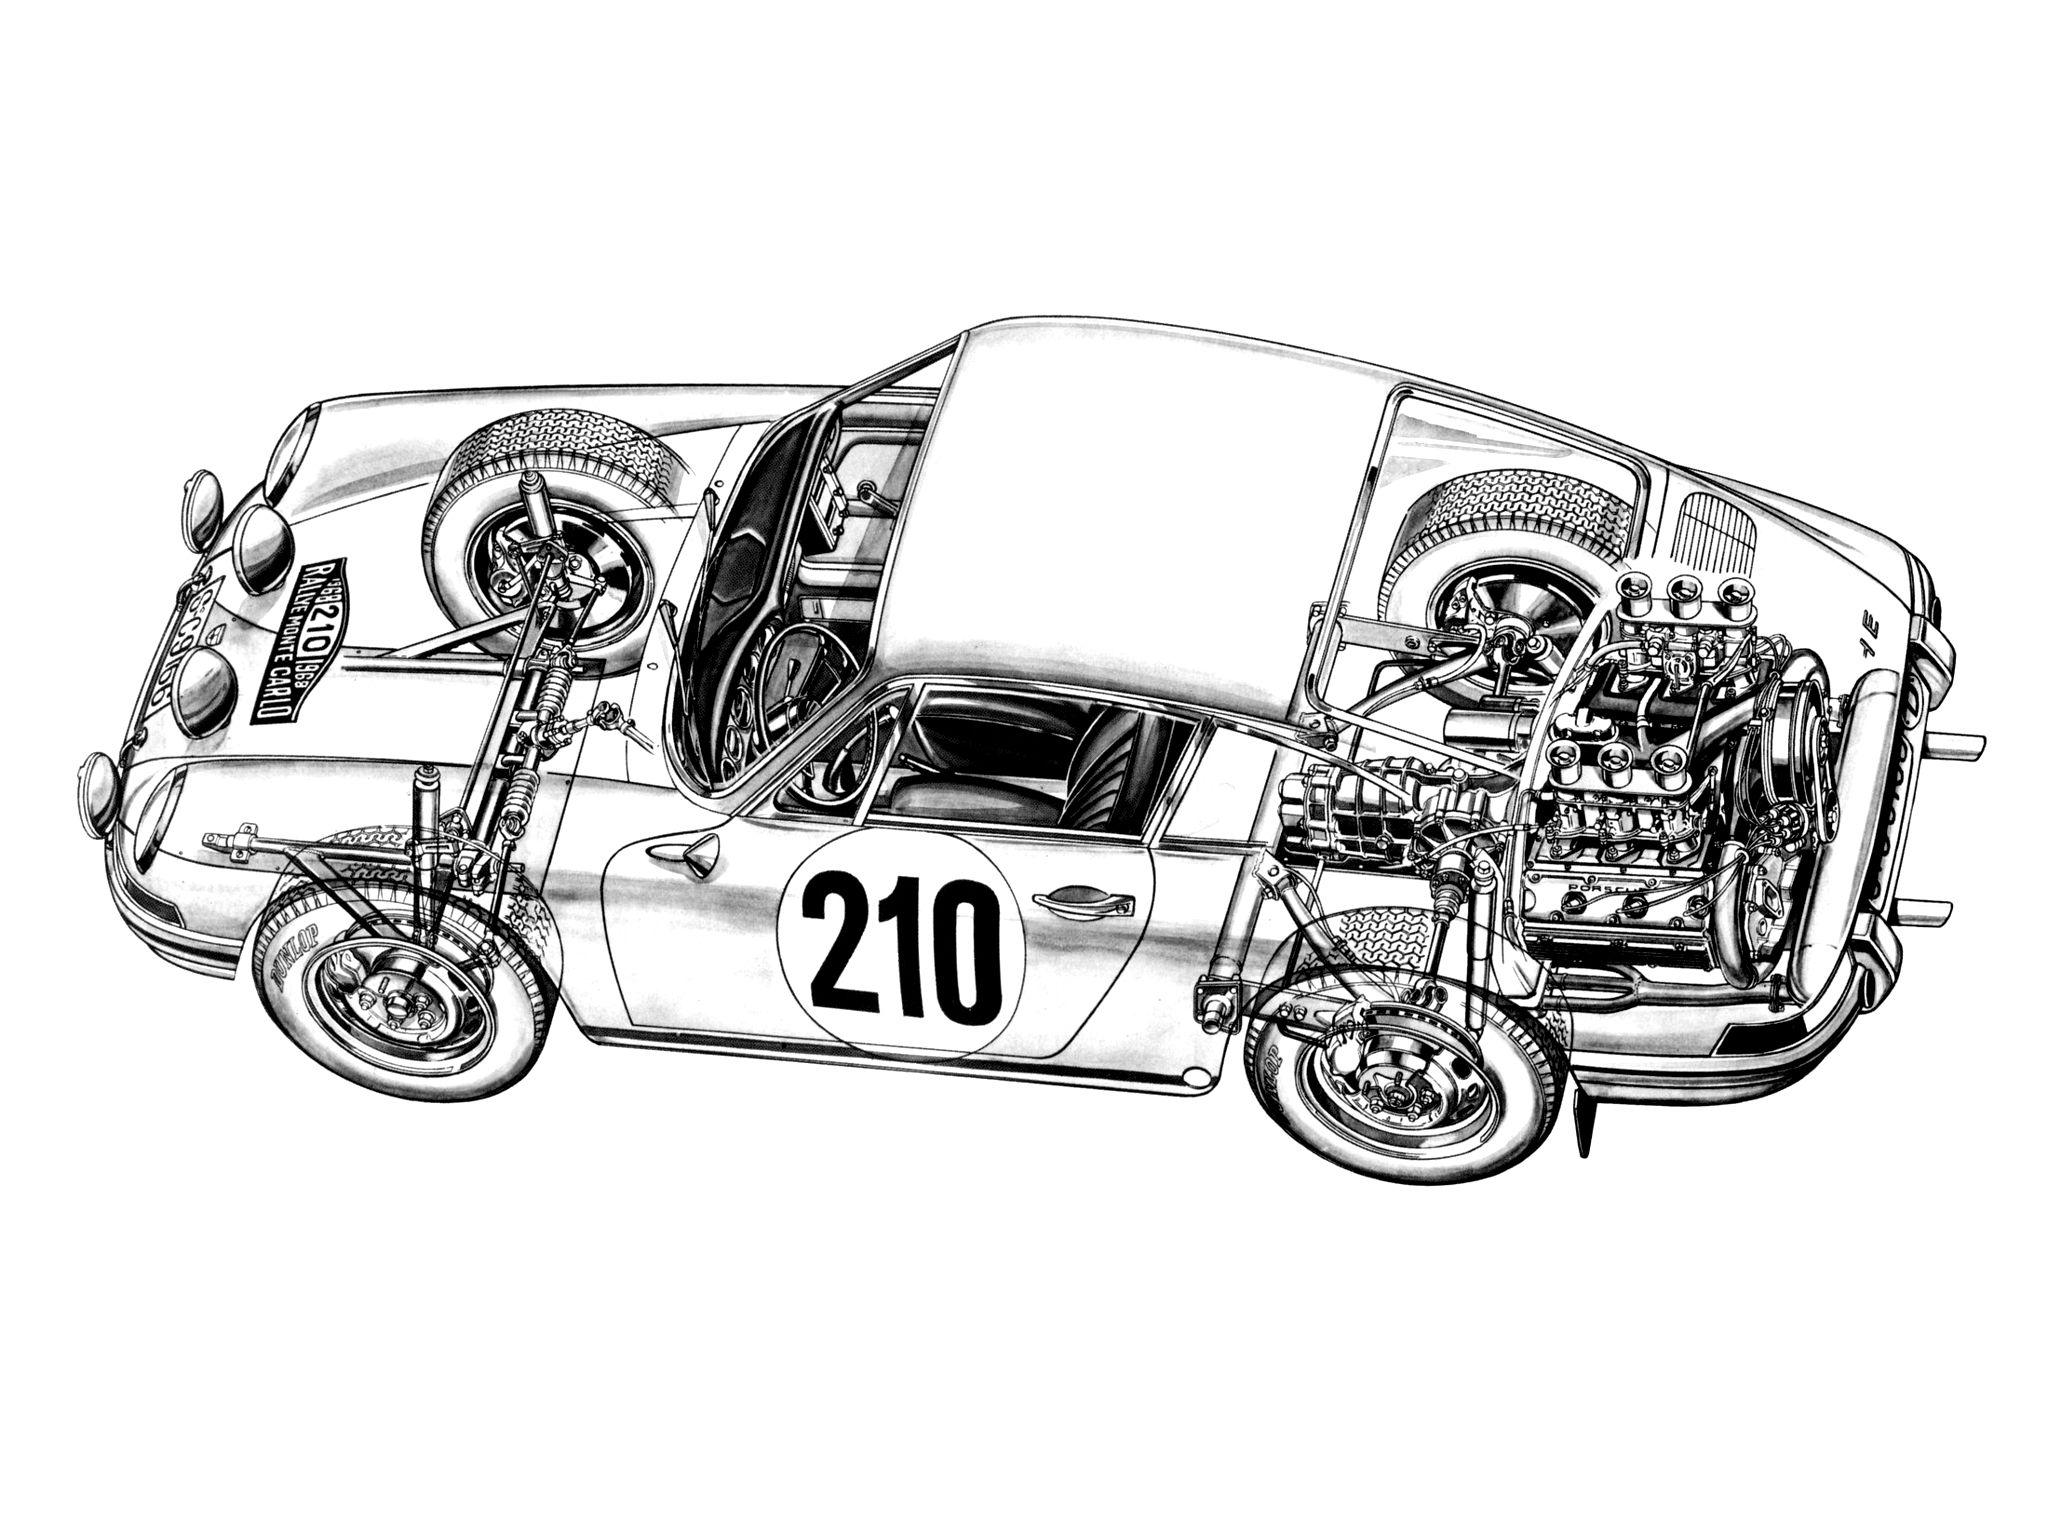 V6 Engine Dimensions